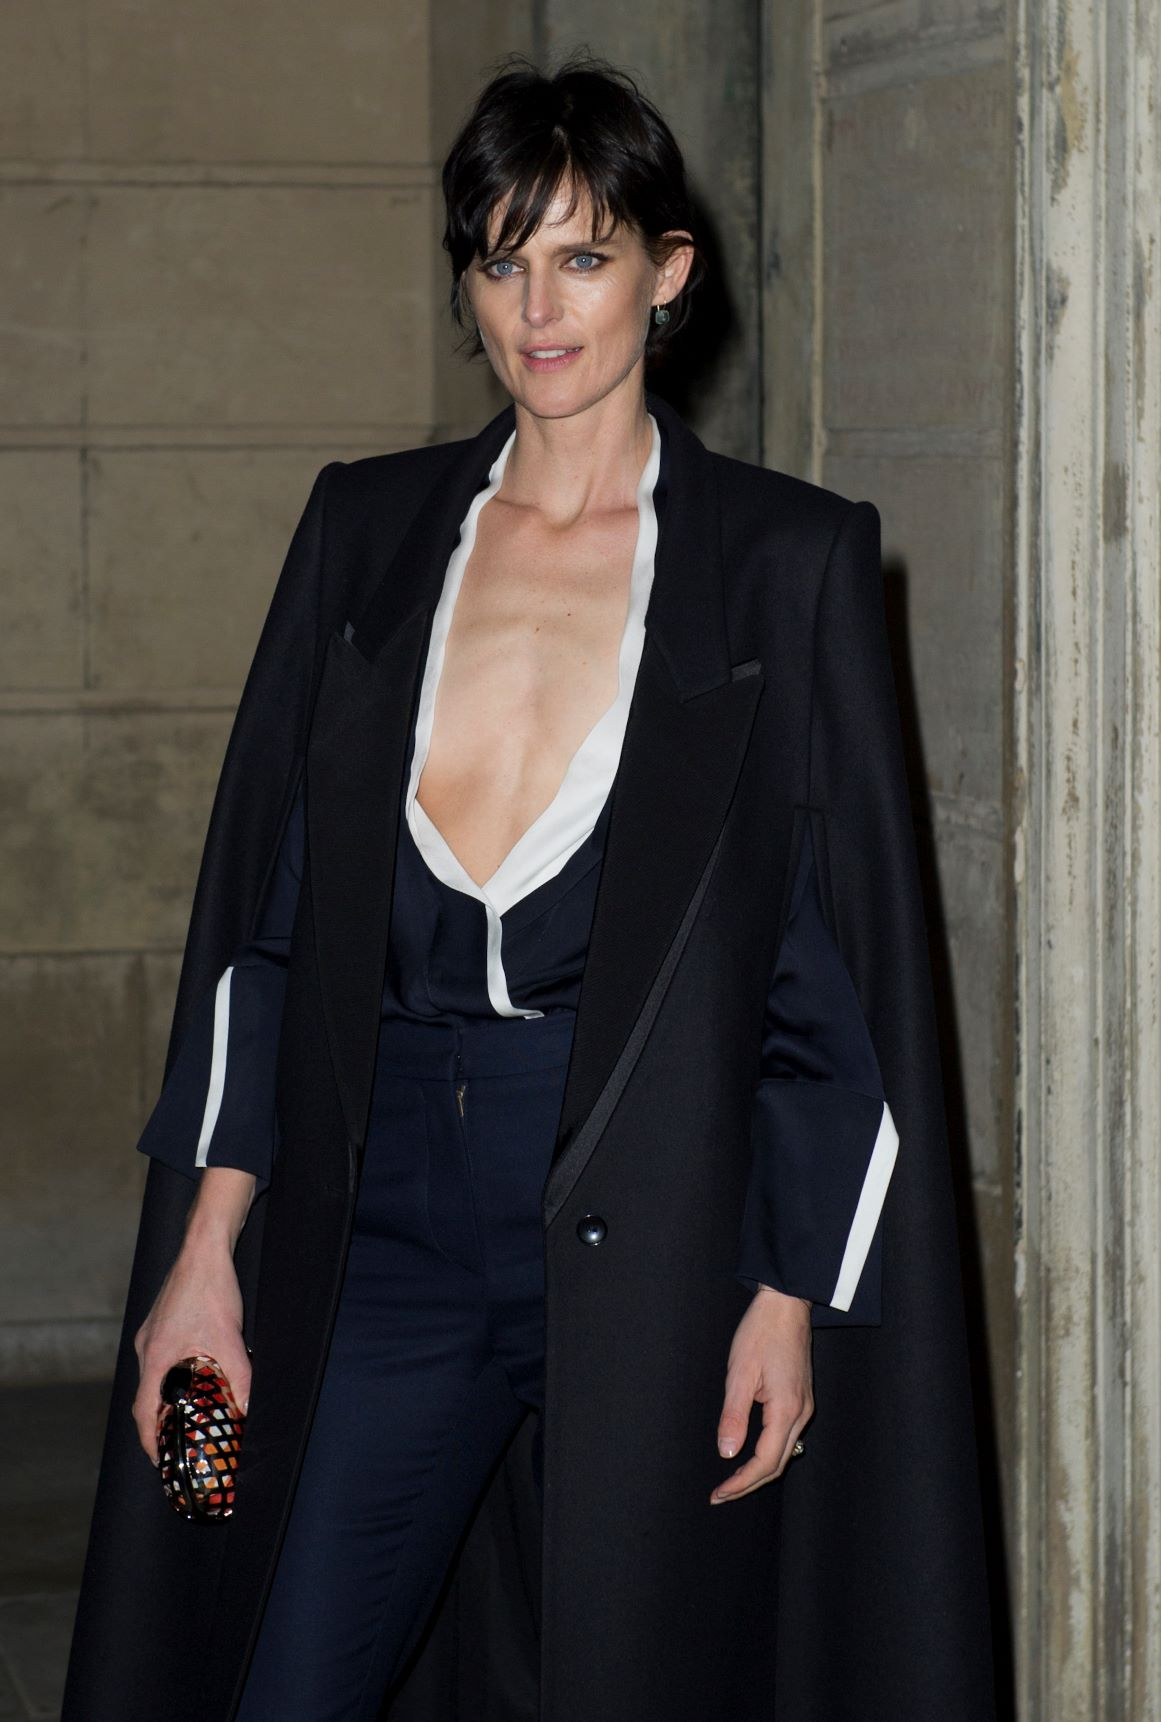 Stella Tennant: Έφυγε από τη ζωή ένα από τα πιο διάσημα top models των 90s